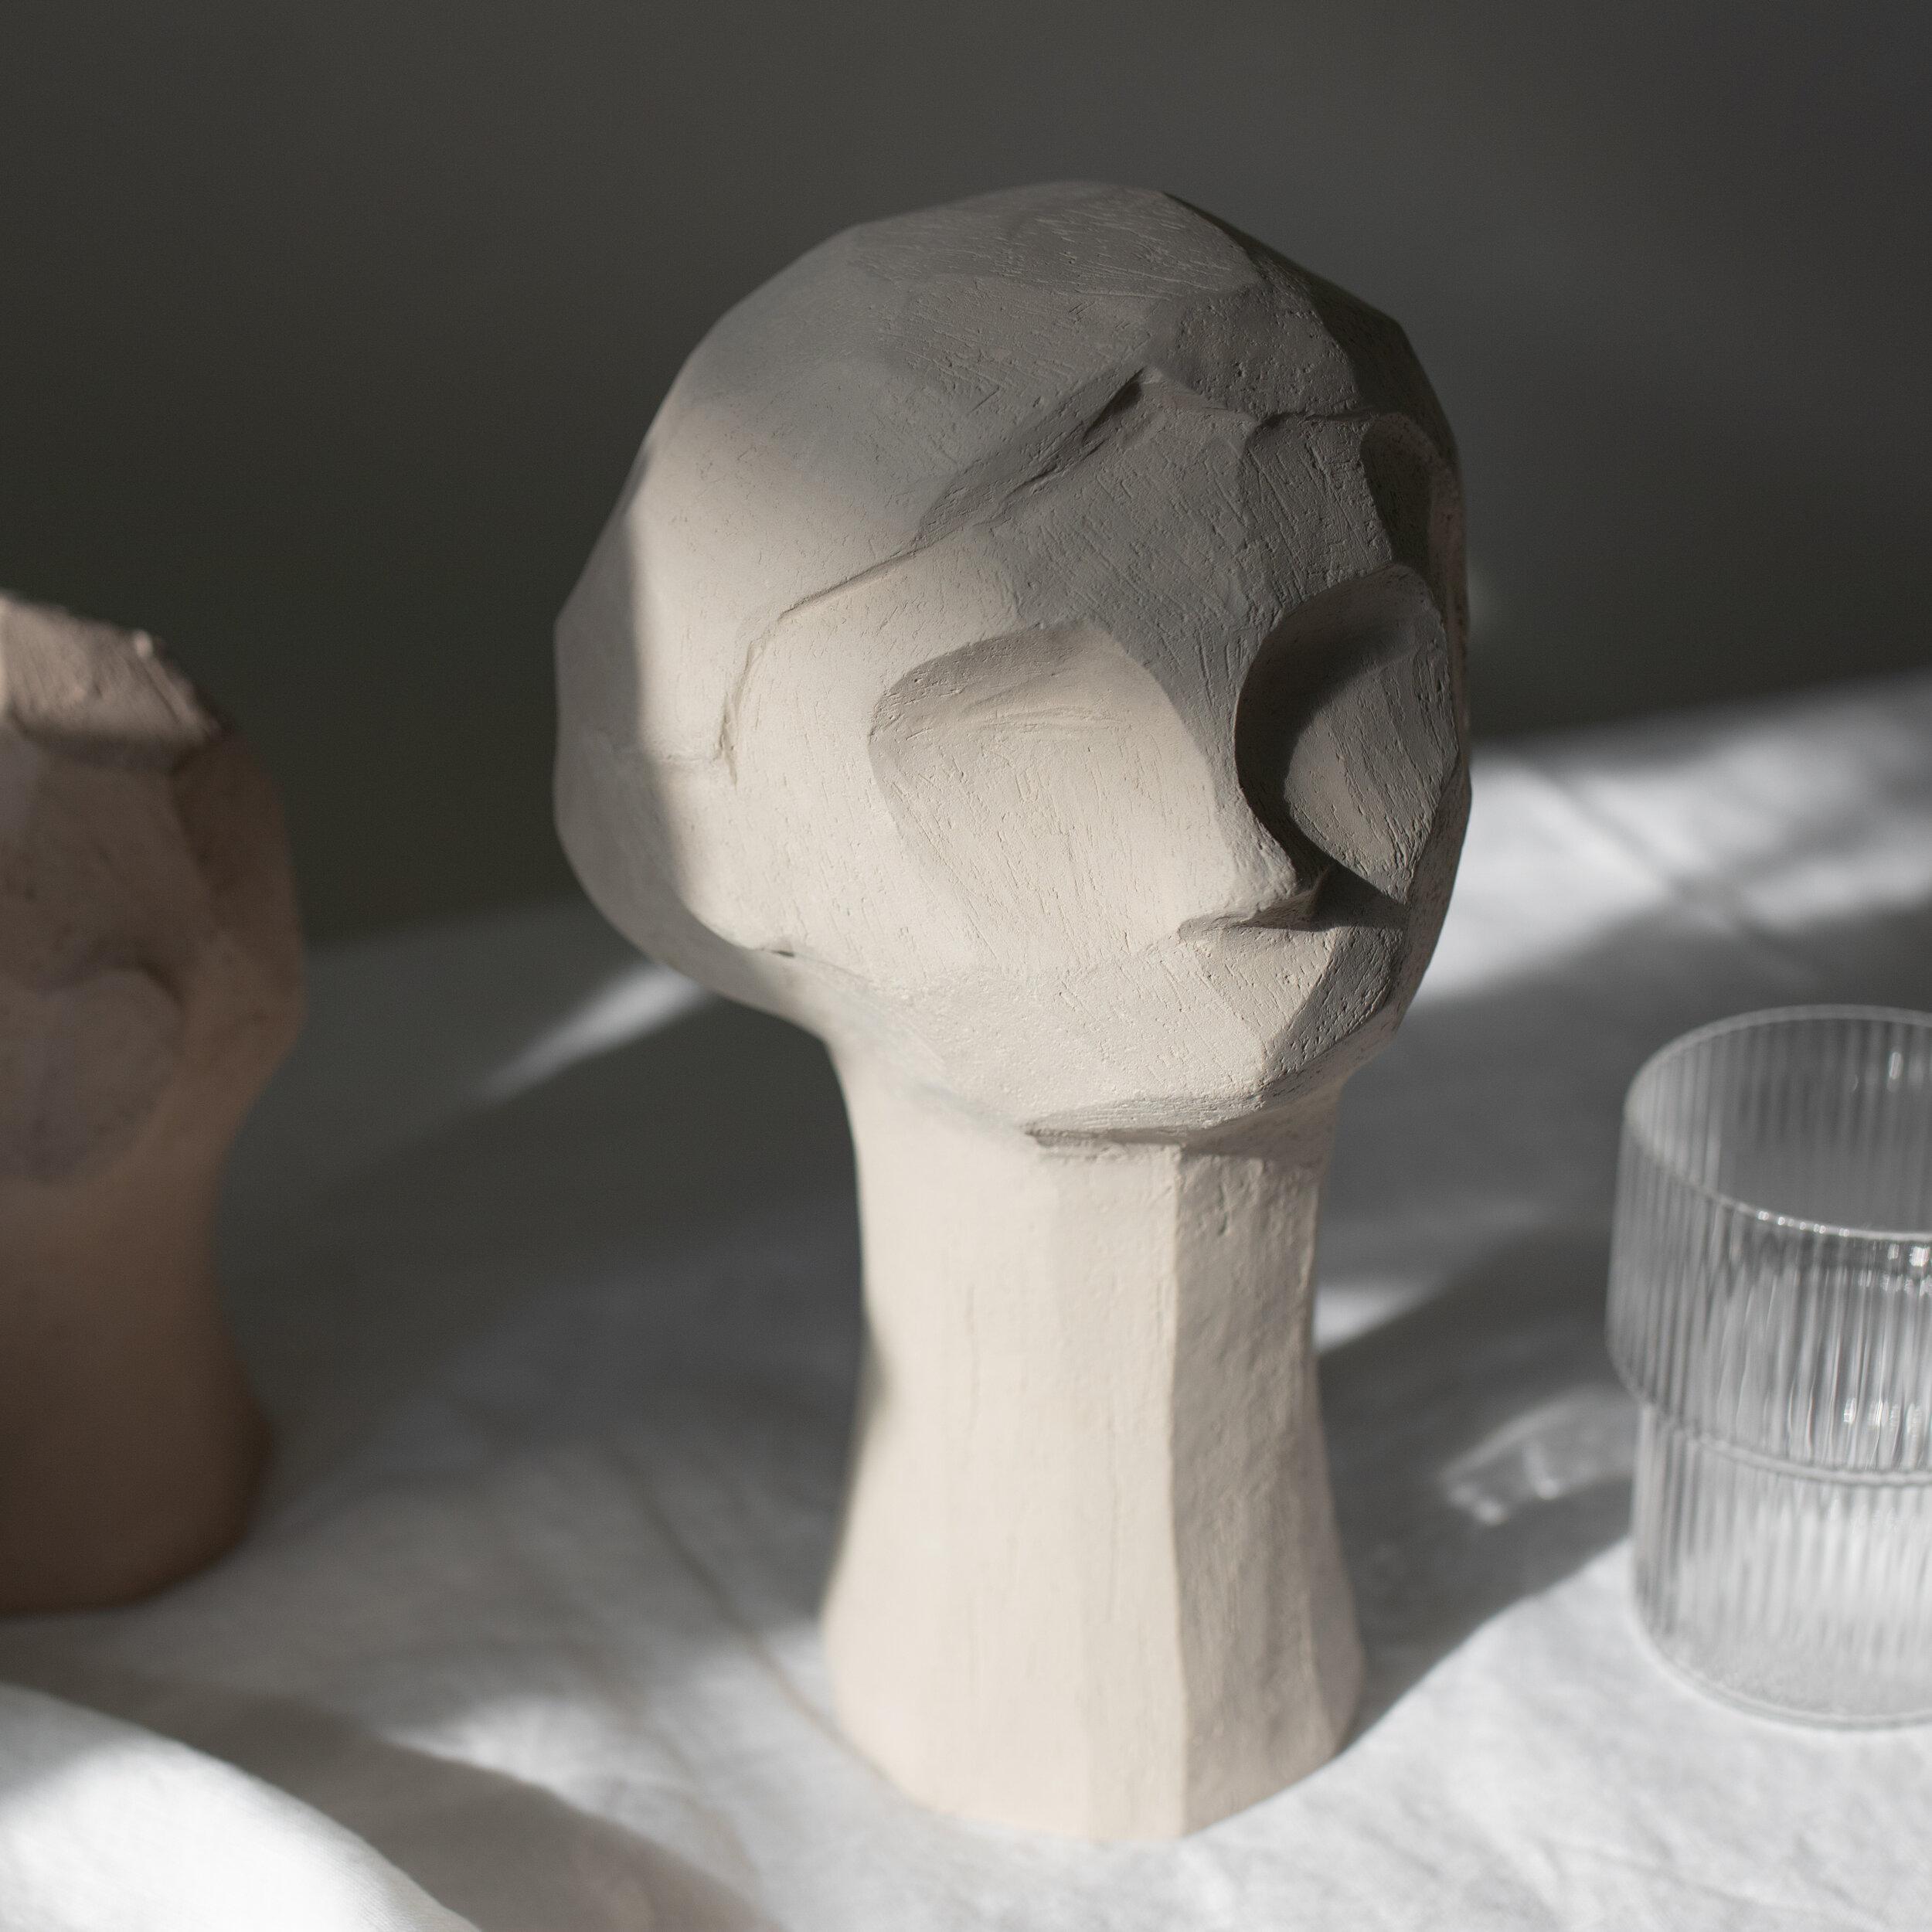 Kristiina  sculpture on my table, enjoying the afternoon light.